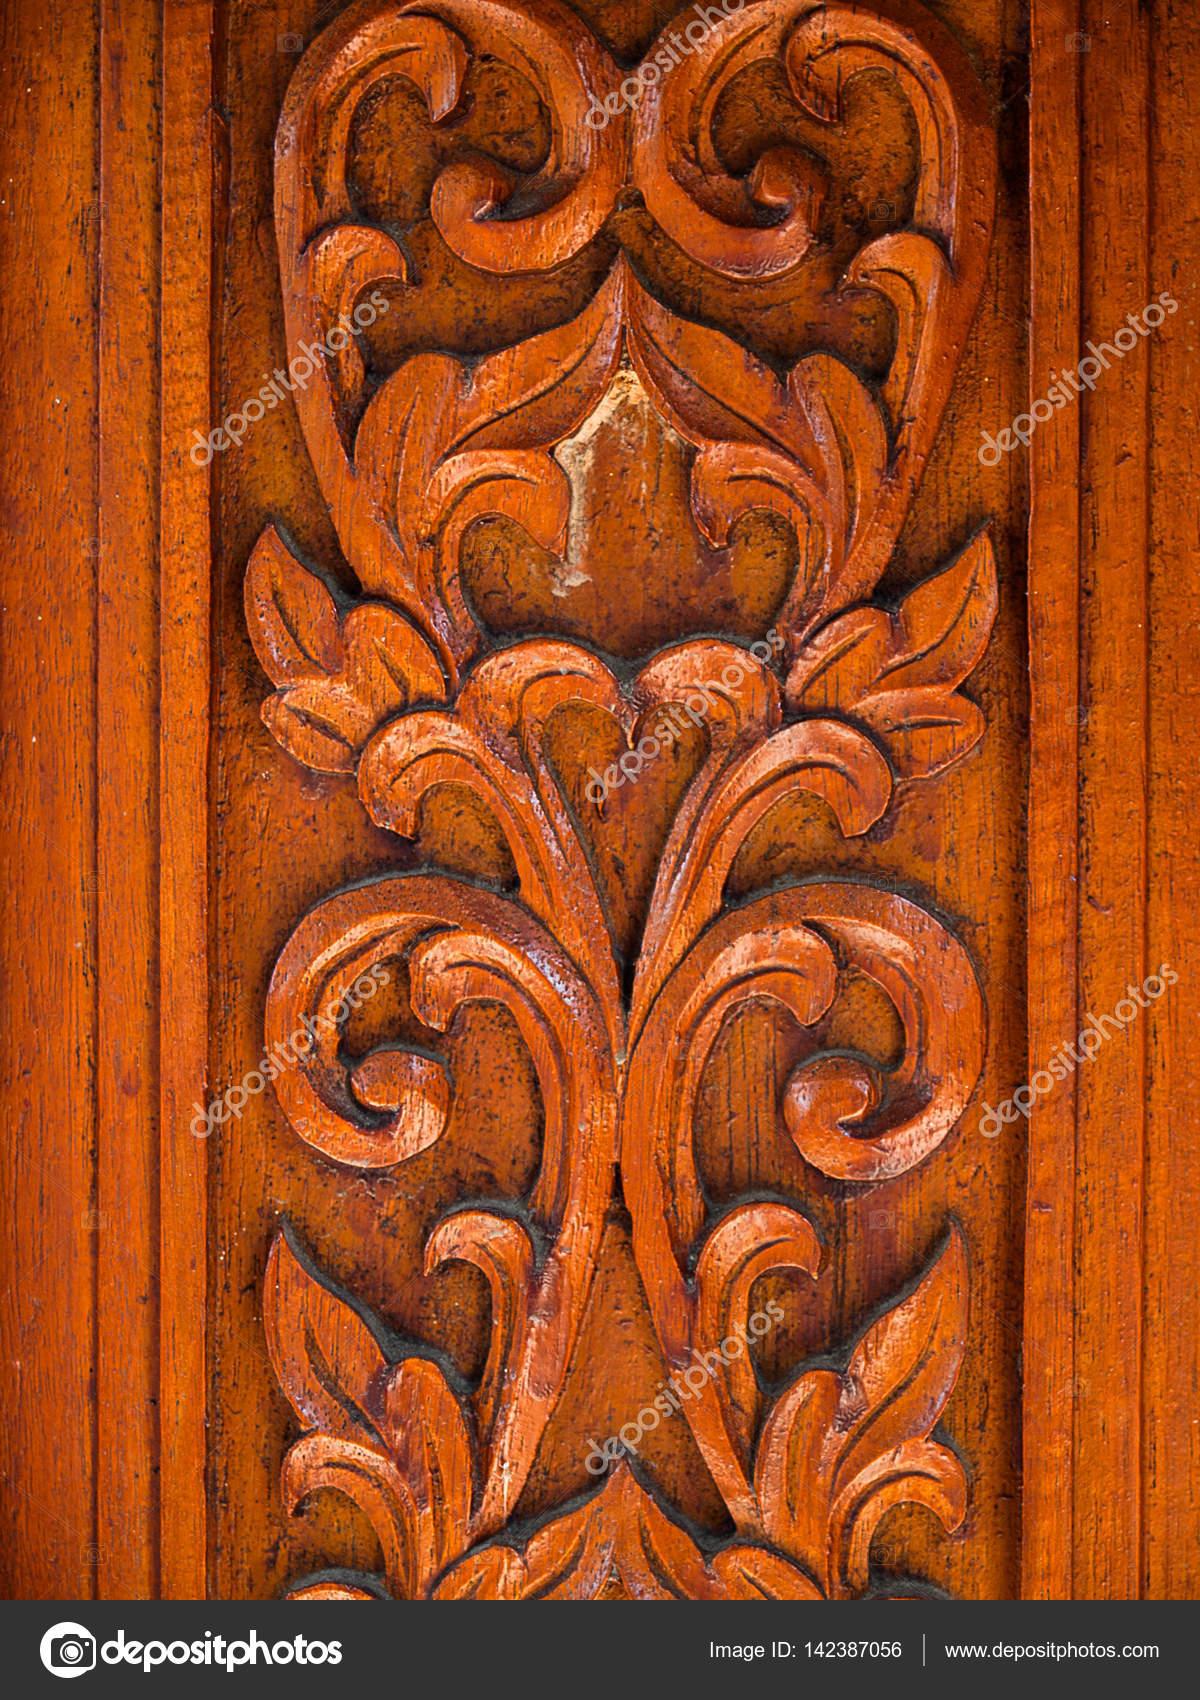 Art of wood carving. details threads u2014 stock photo © kun2512 #142387056